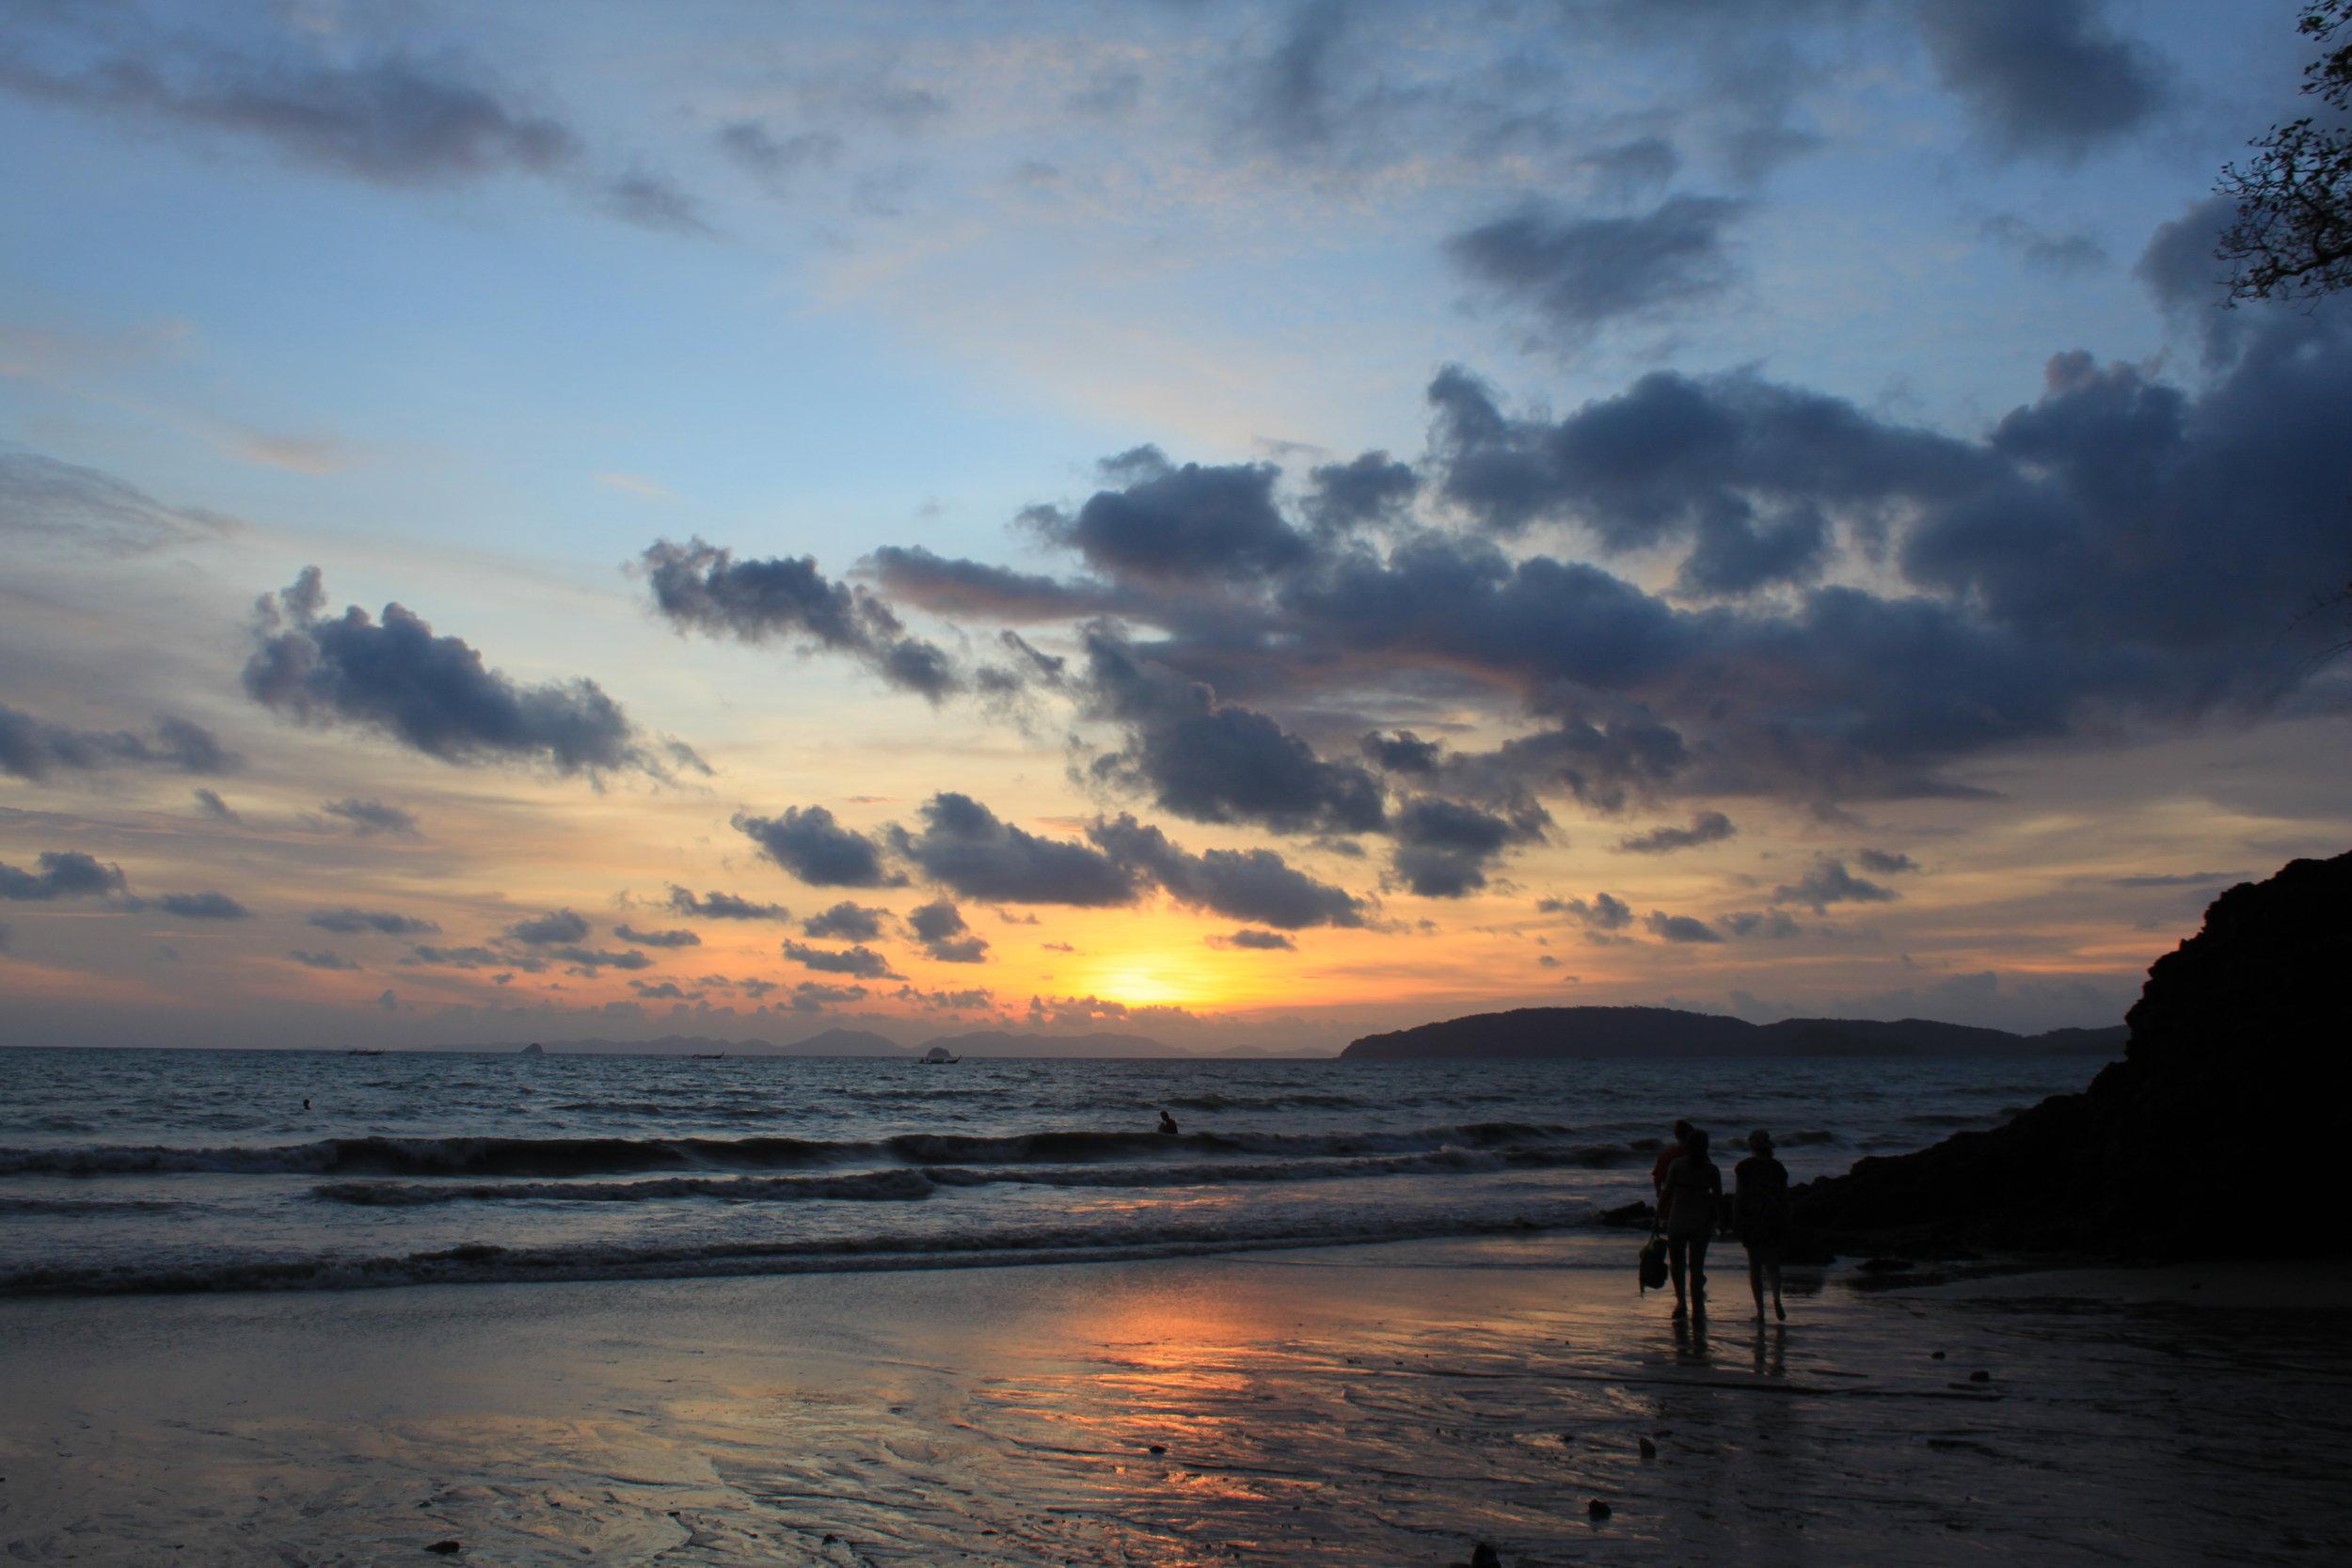 Sunset, Ao Nang Beach Krabi